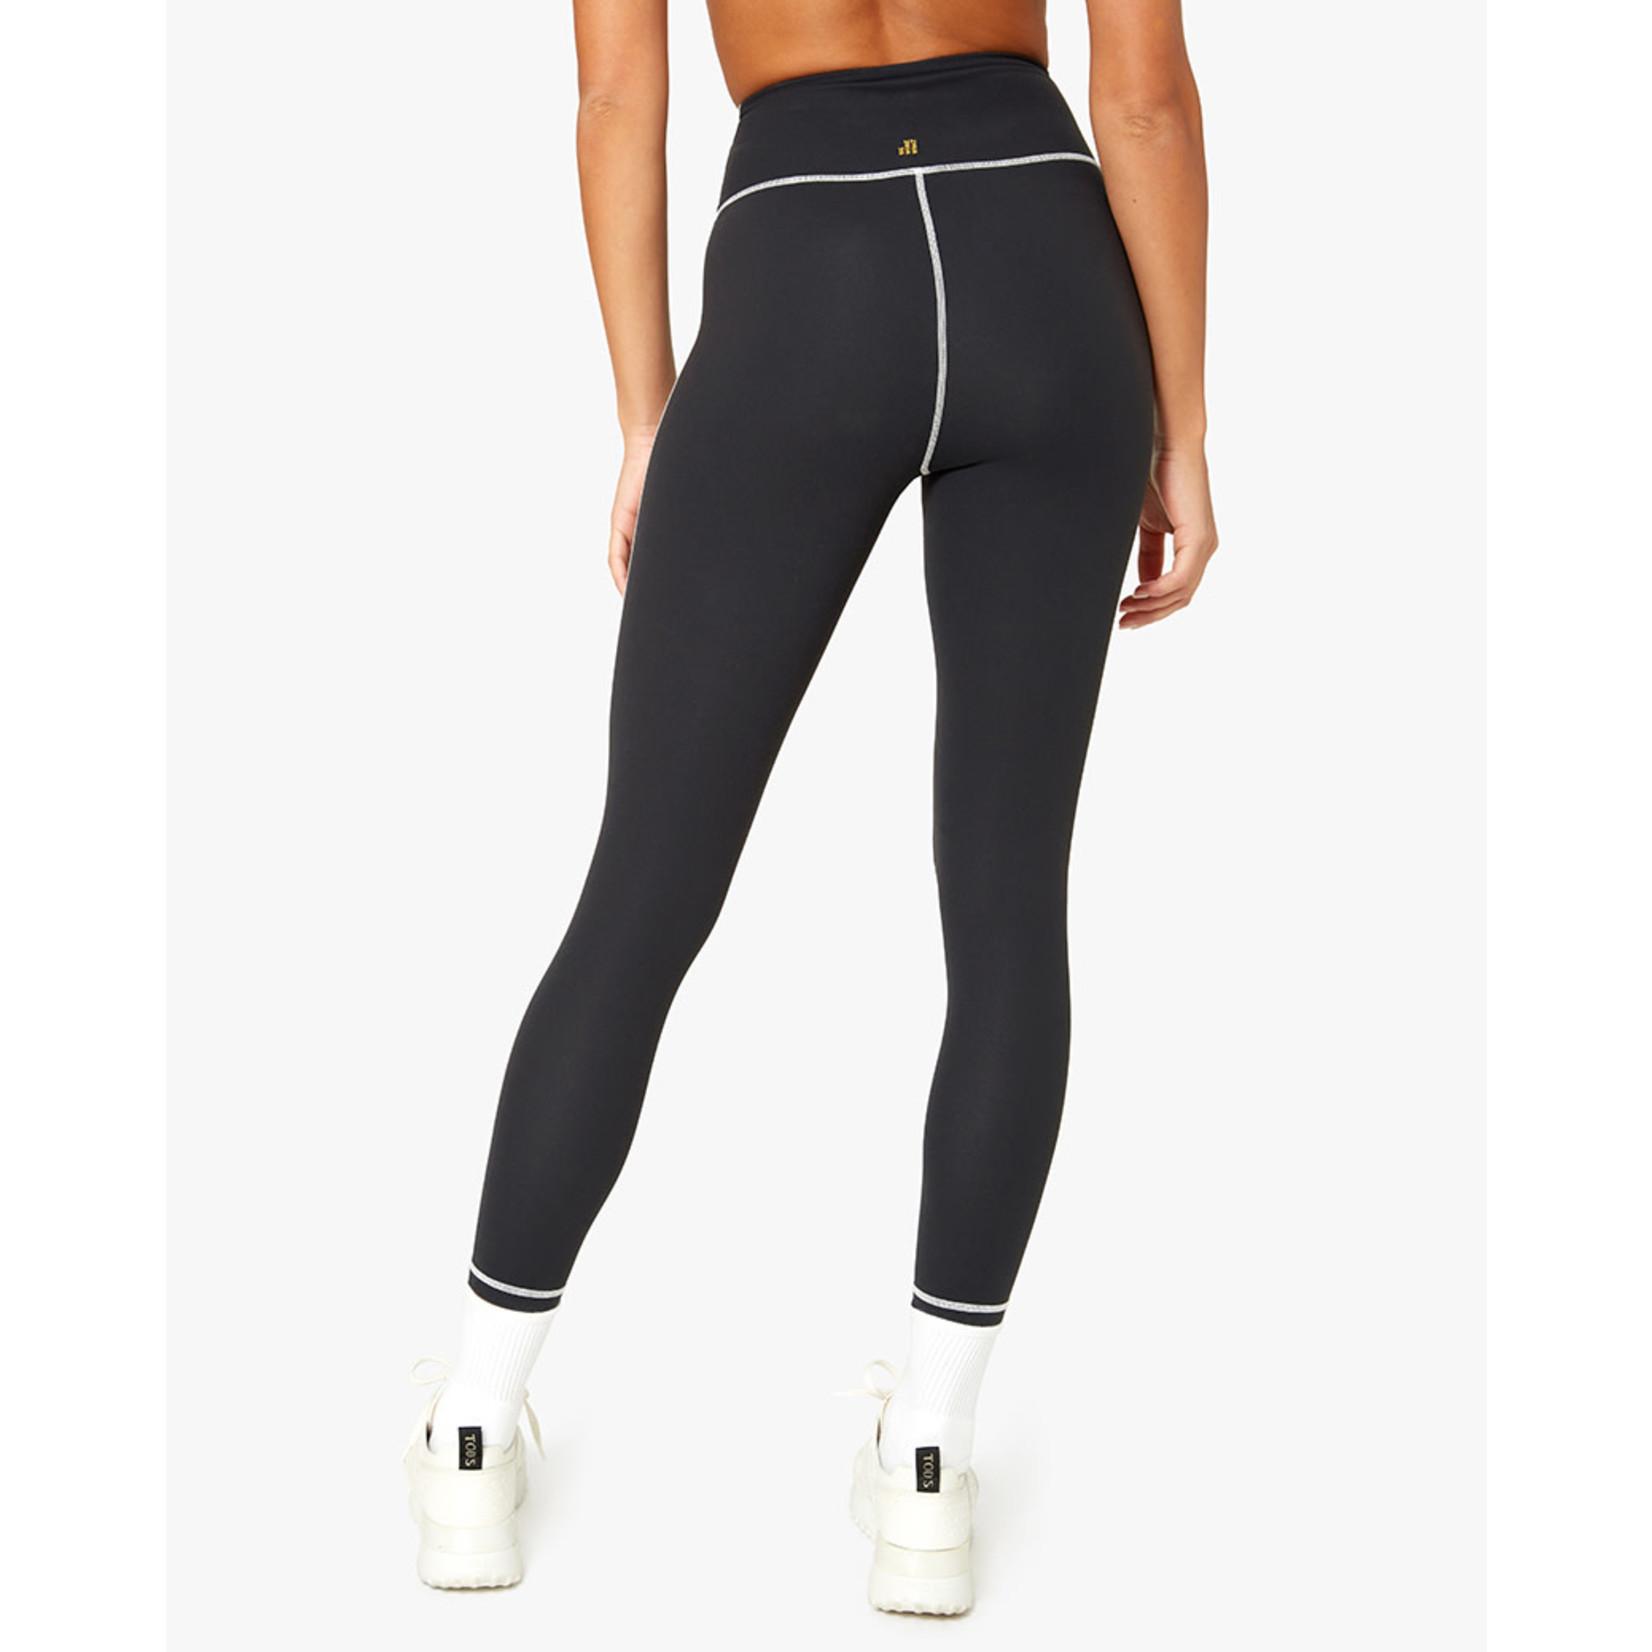 Shop WeWoreWhat Black Corset Legging